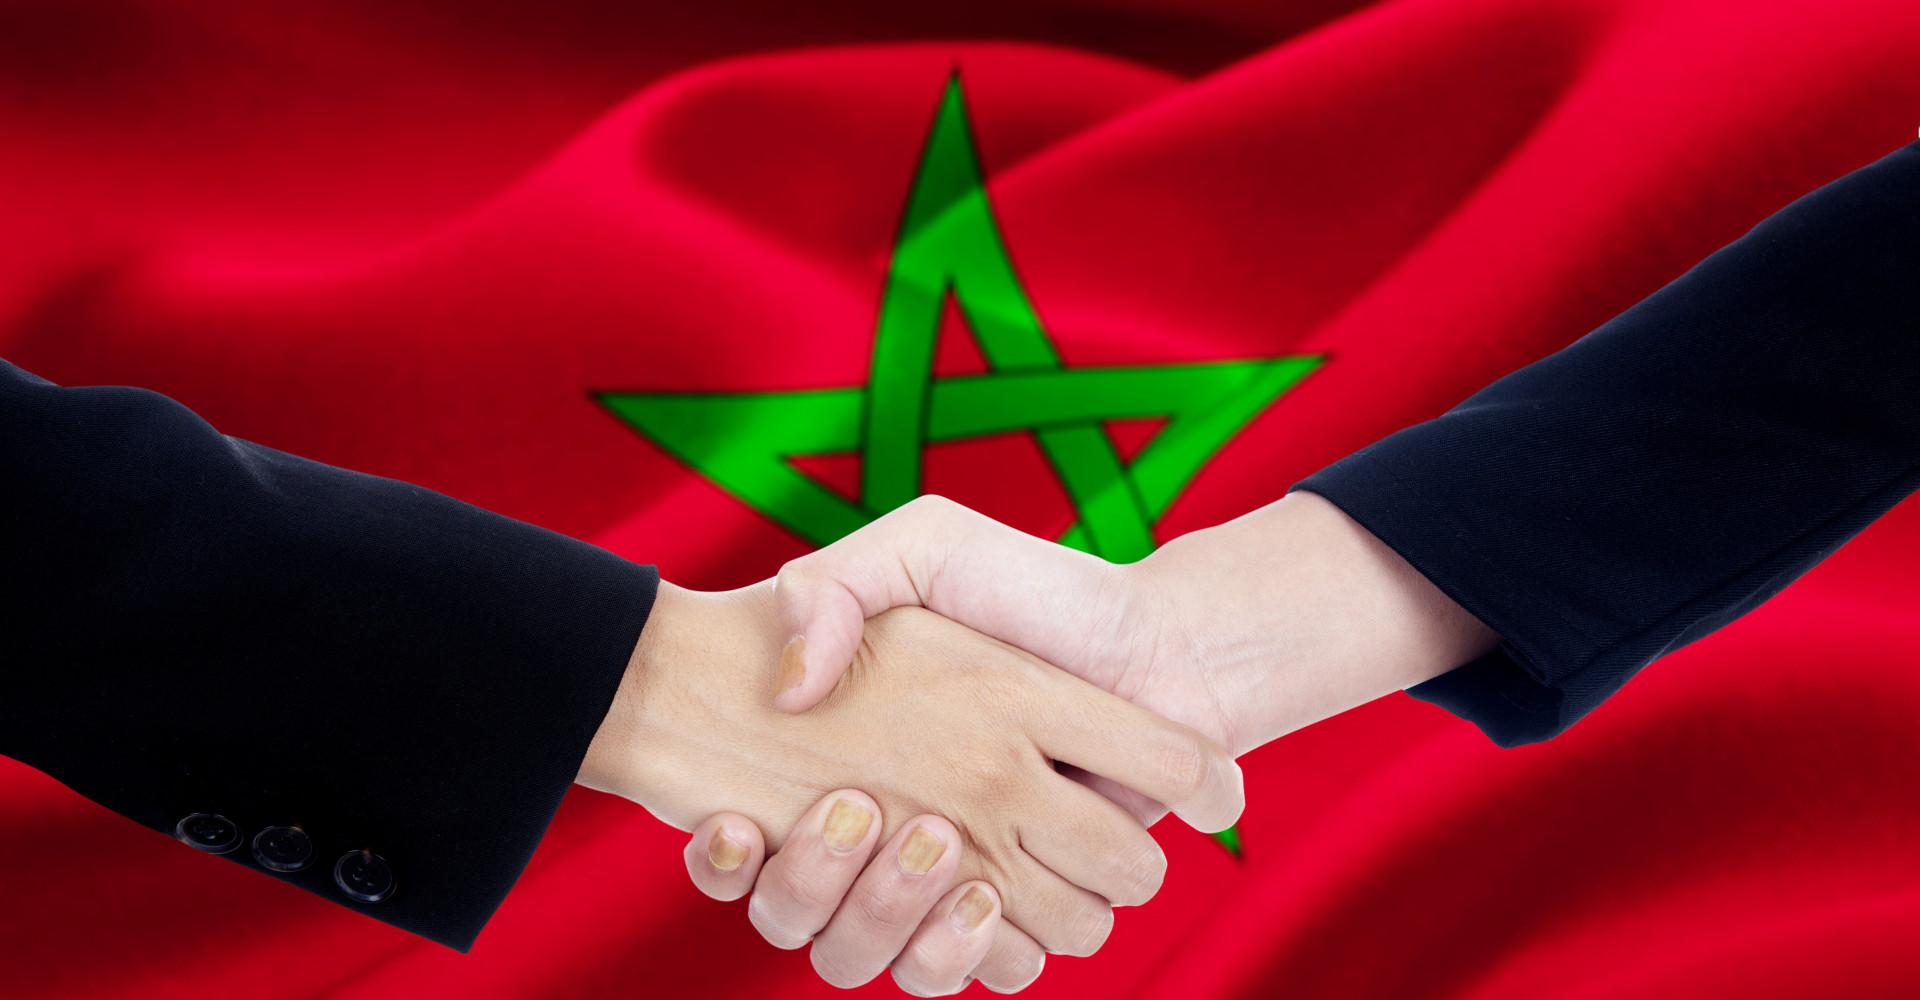 Descubra curiosidades sobre Marrocos que o vão surpreender